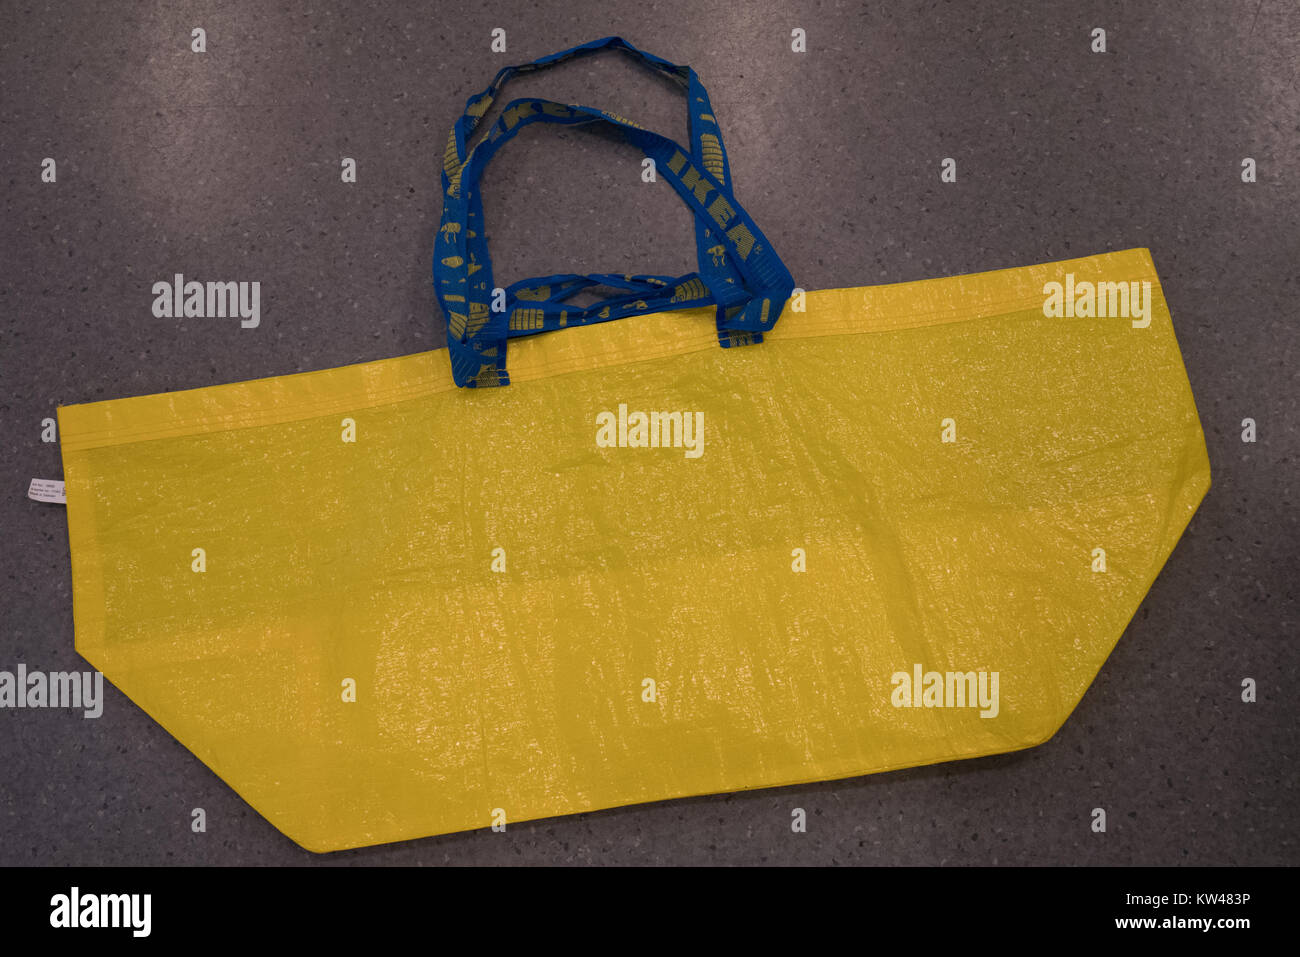 yellow ikea reusable shopping bag - Stock Image